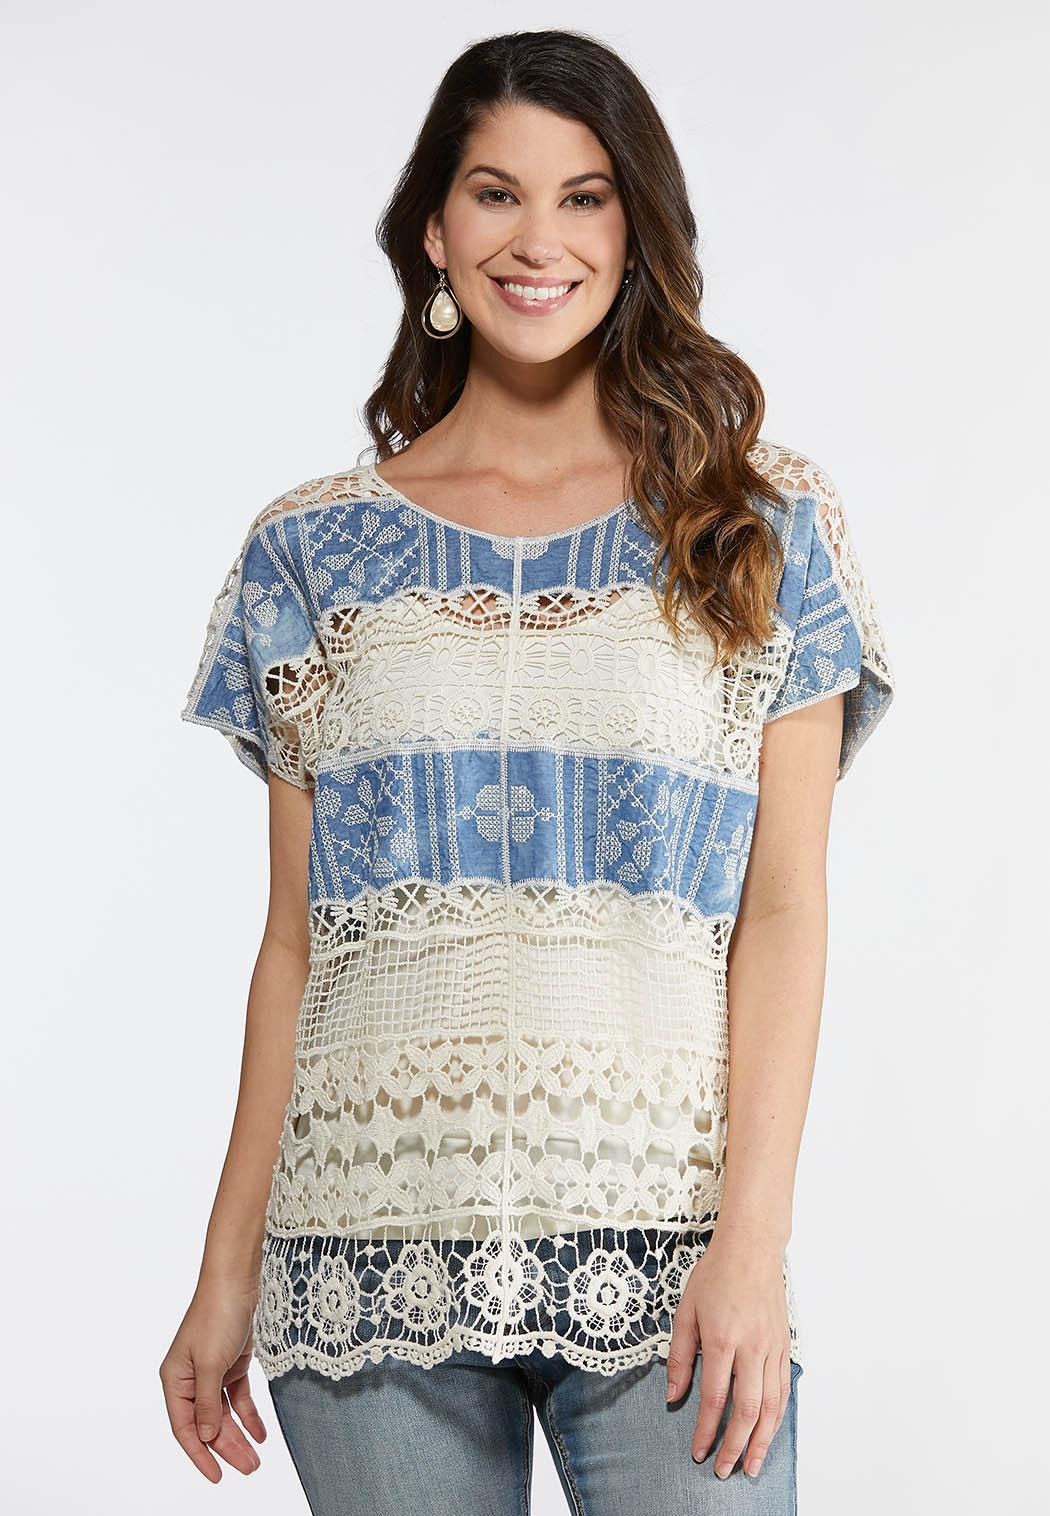 Mixed Crochet Top